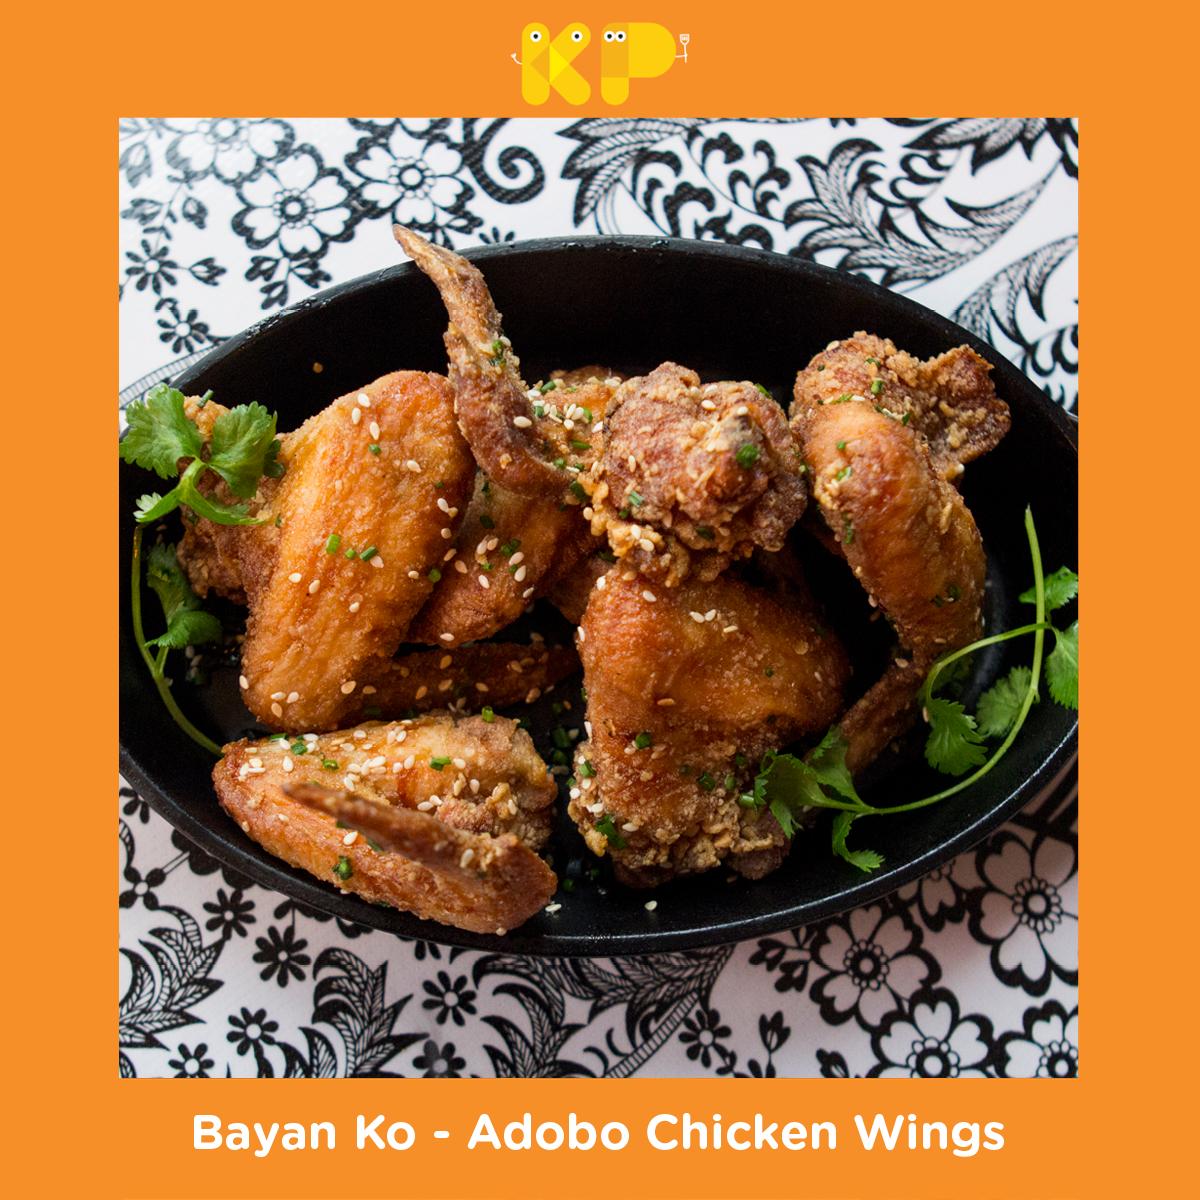 BayanKo_ChickenWIngs_2.png